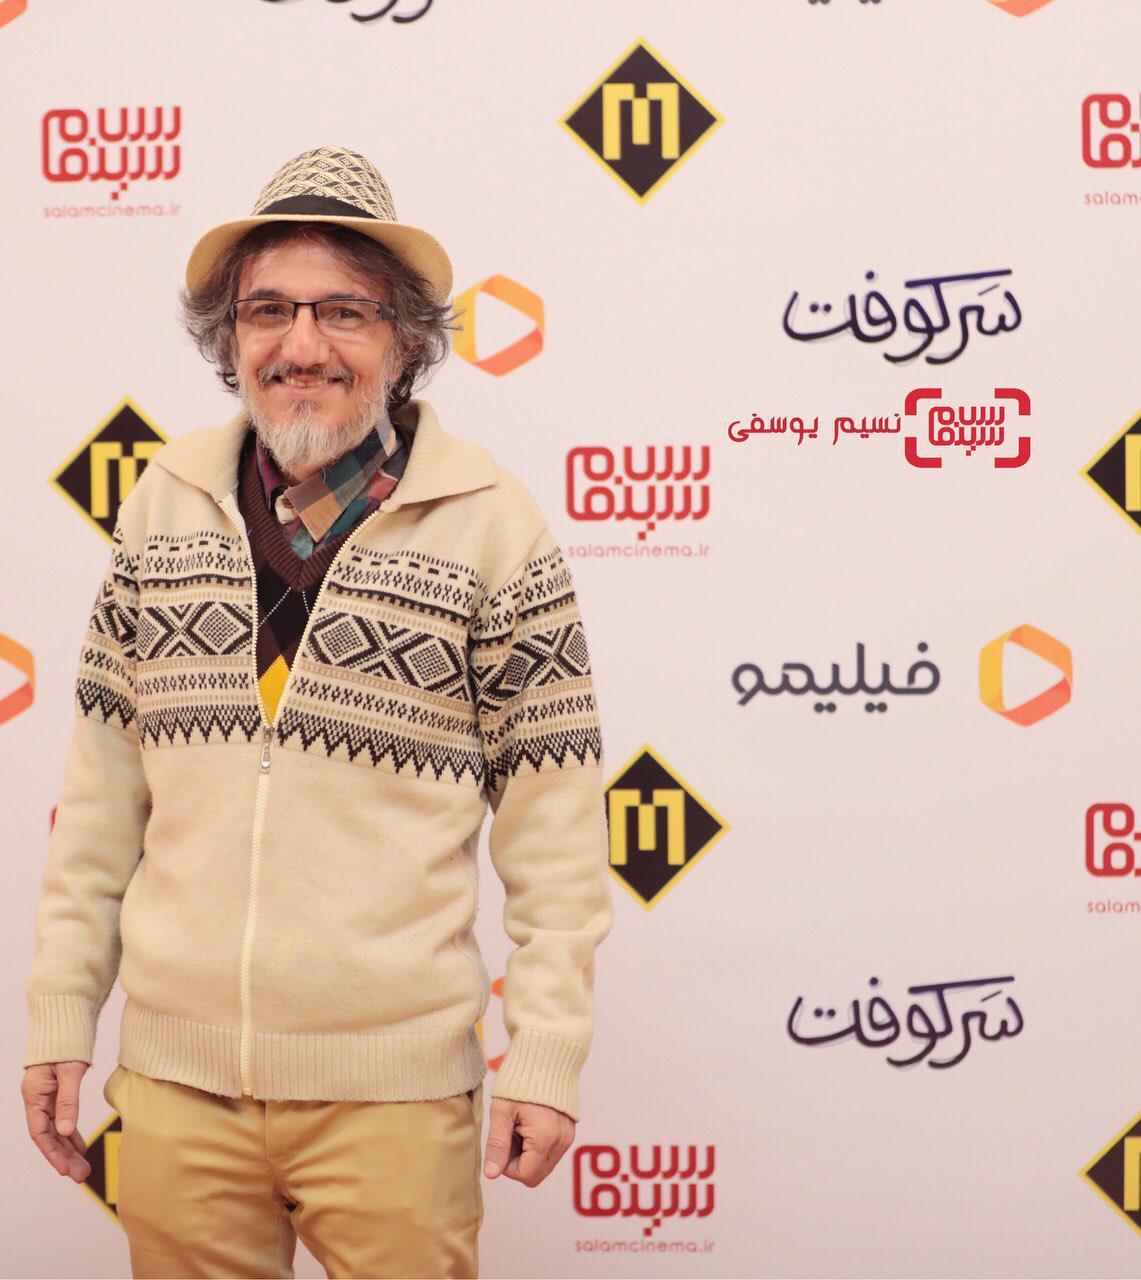 کریم رجبی در اکران خصوصی فیلم «سرکوفت» / گزارش تصویری